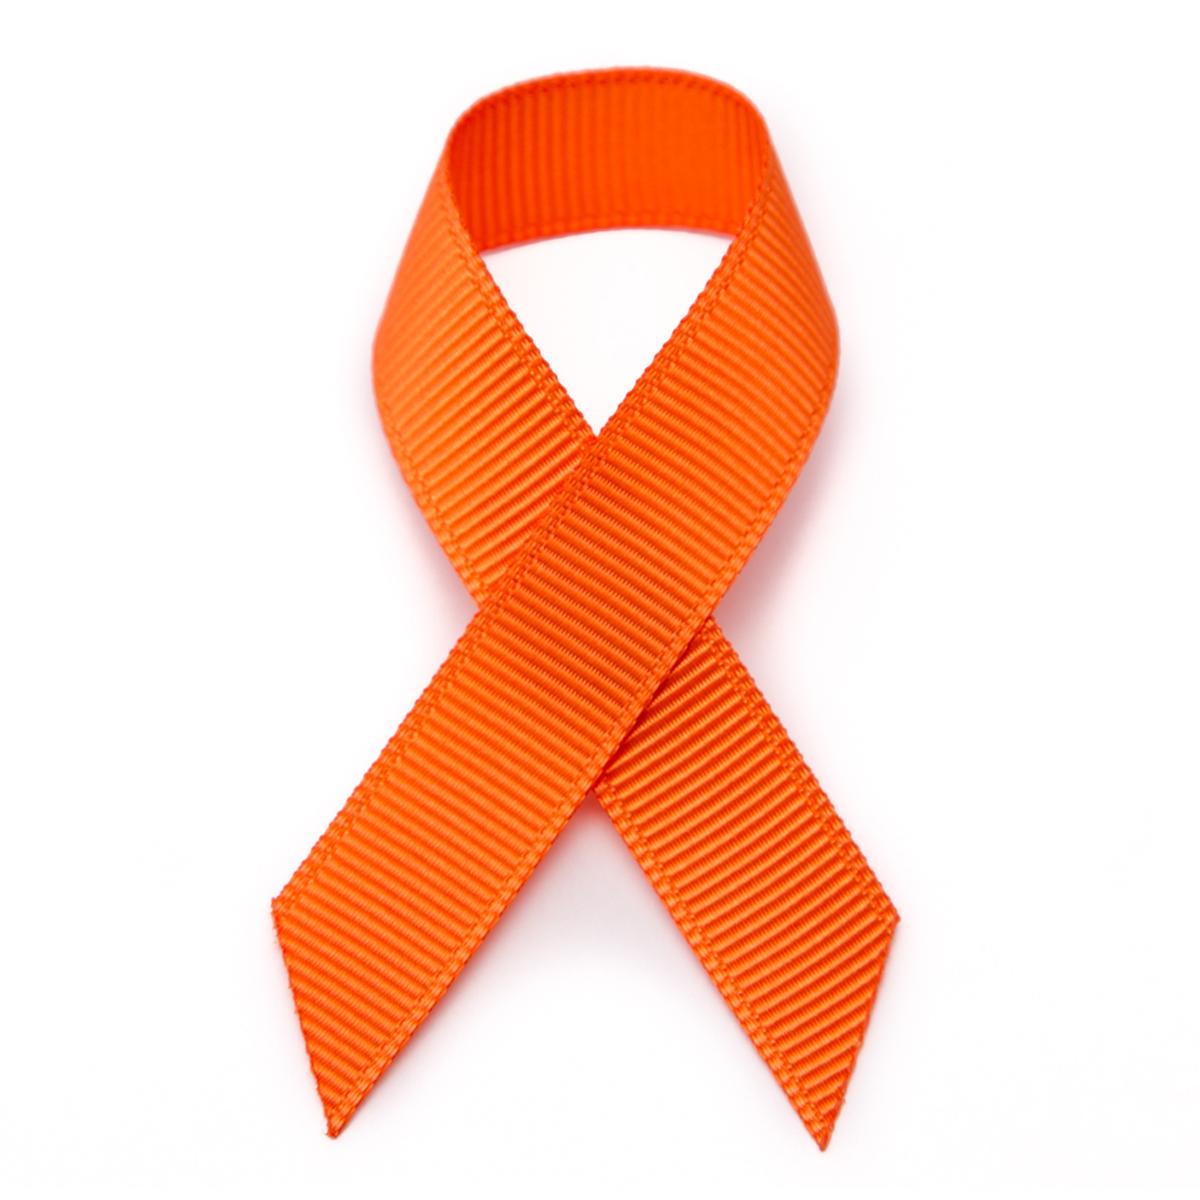 Break the Silence, Stop the Violence: Wear Orange Day